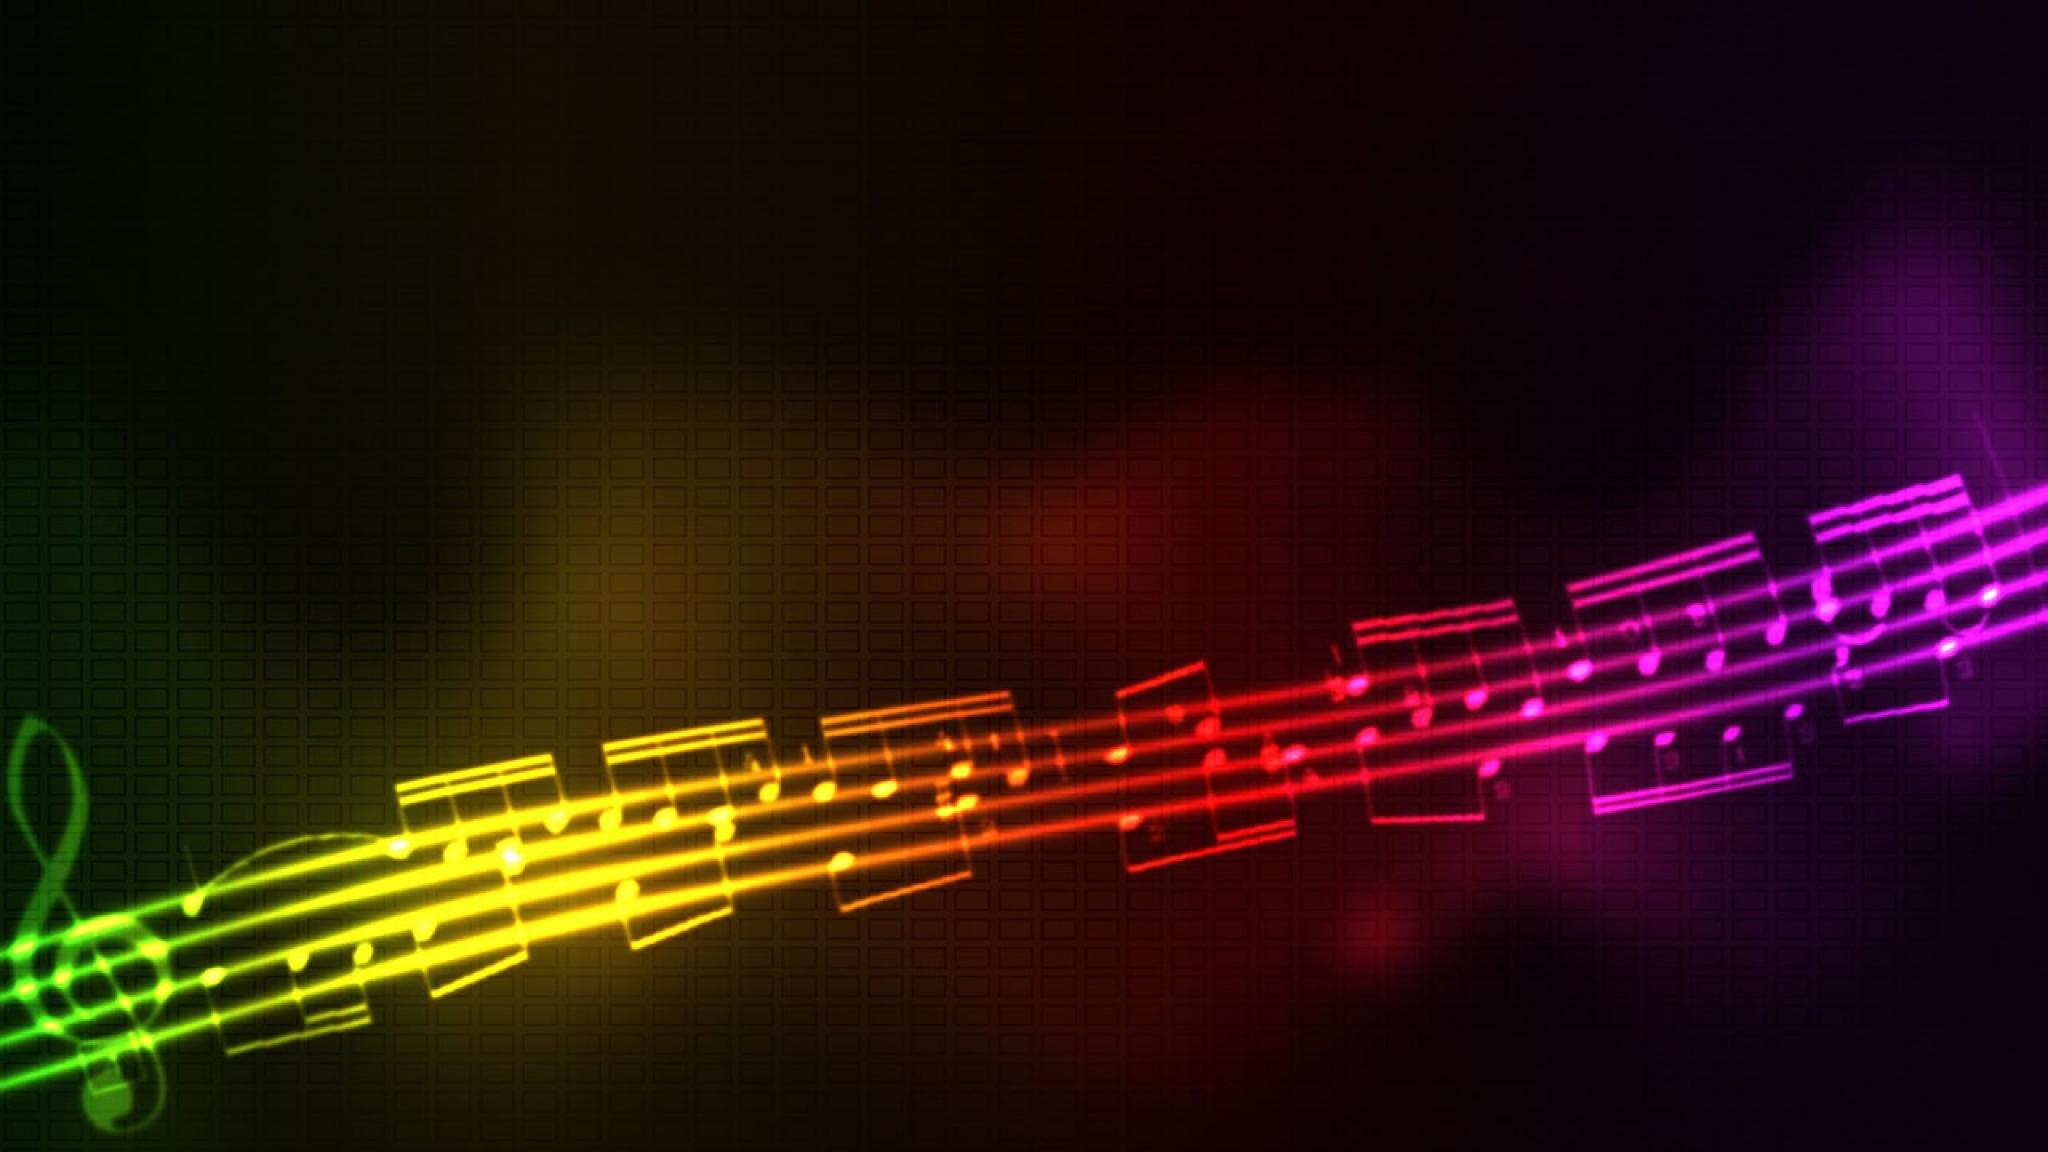 free-dj-music-wallpapers-hd-music-desktop-backgrounds-follow-us-on-3-2048×1152